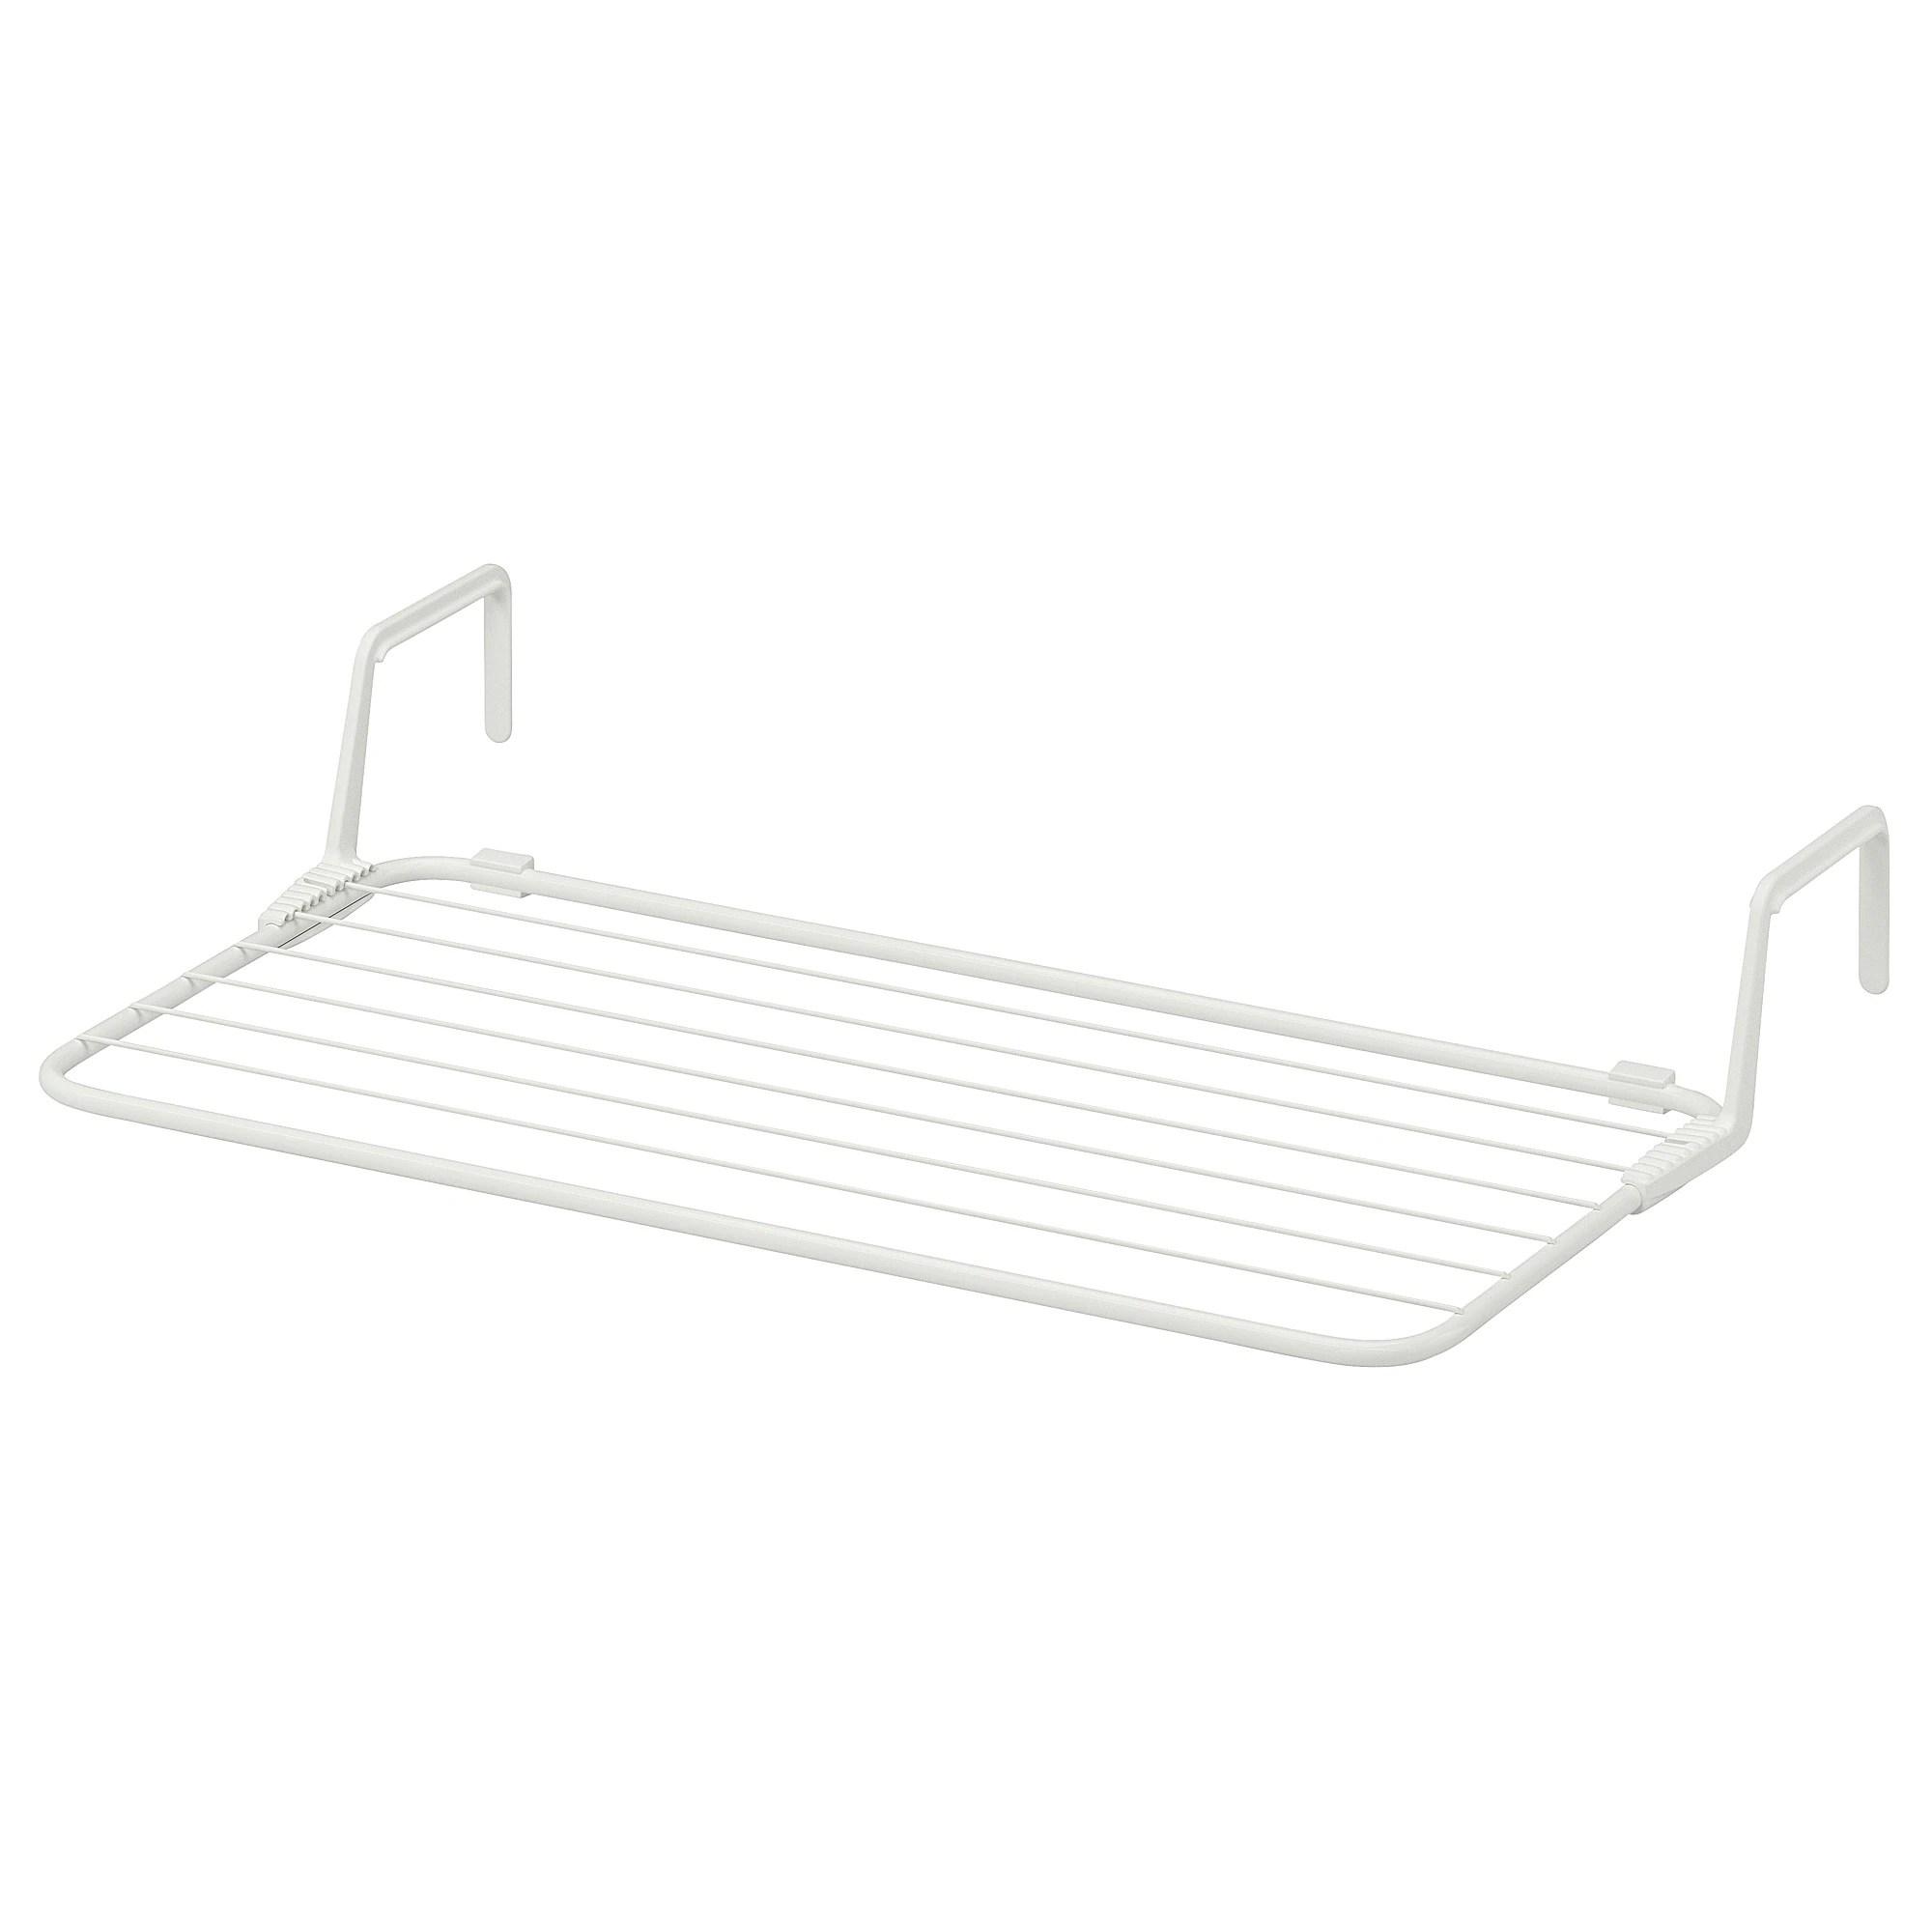 Sechoirs A Linge Ikea